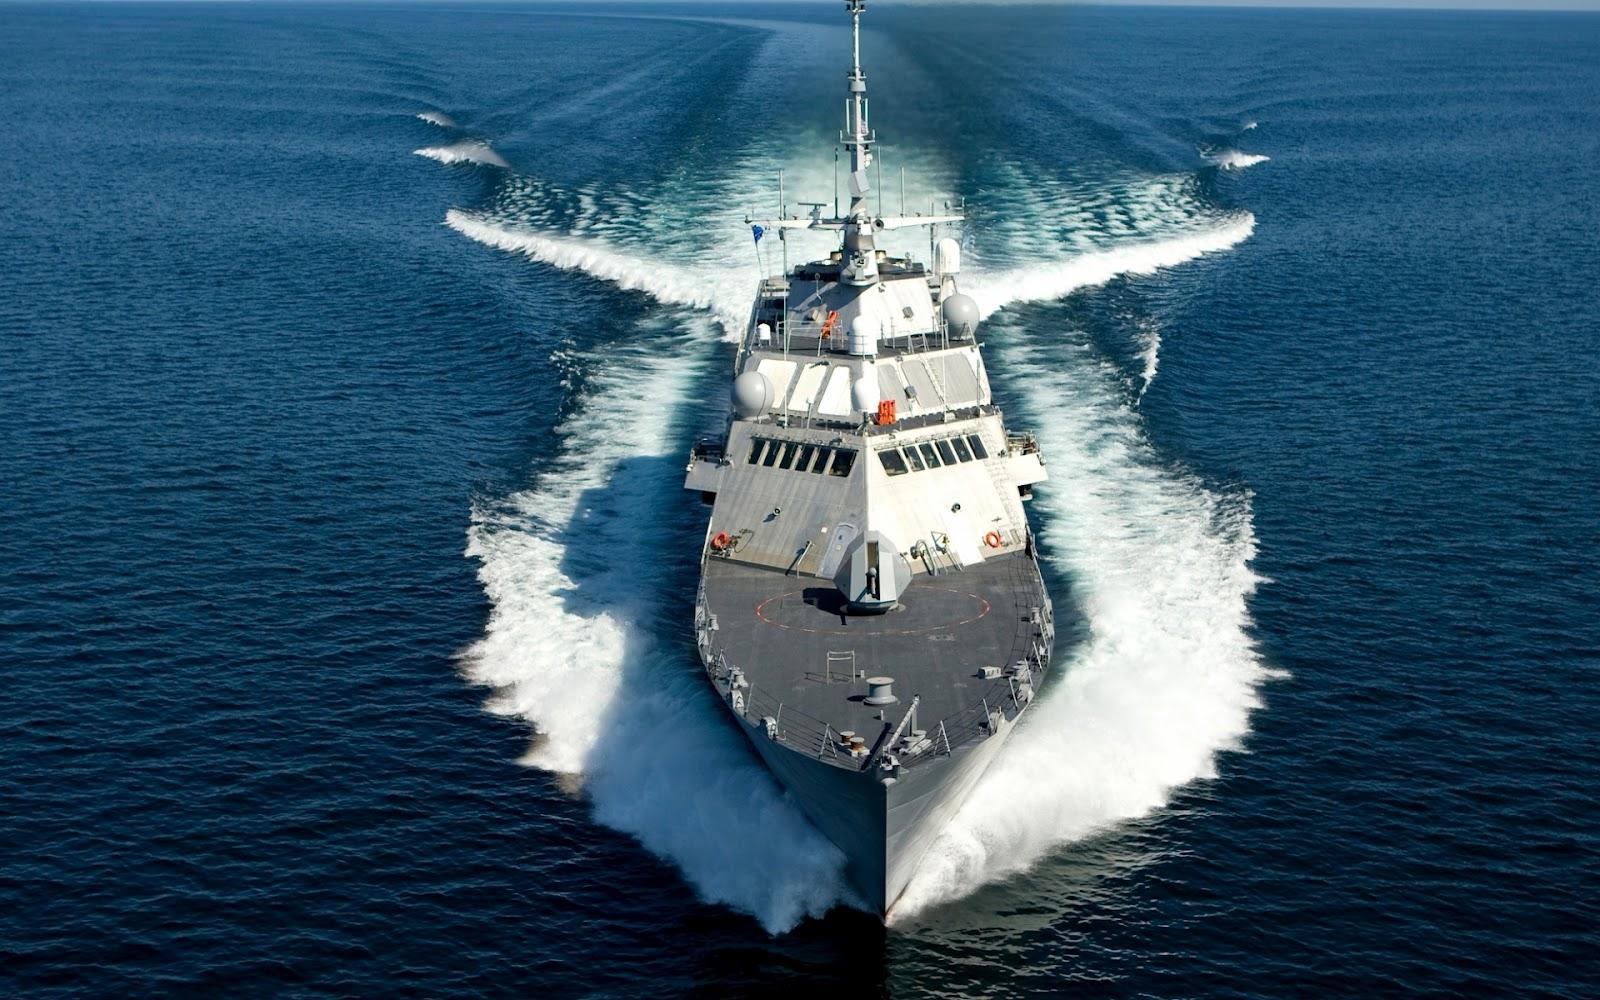 http://3.bp.blogspot.com/-xUmalEcxVgQ/T3SsMe3L8KI/AAAAAAAAAOU/7EzBqvSpcyc/s1600/navy+ship.jpg